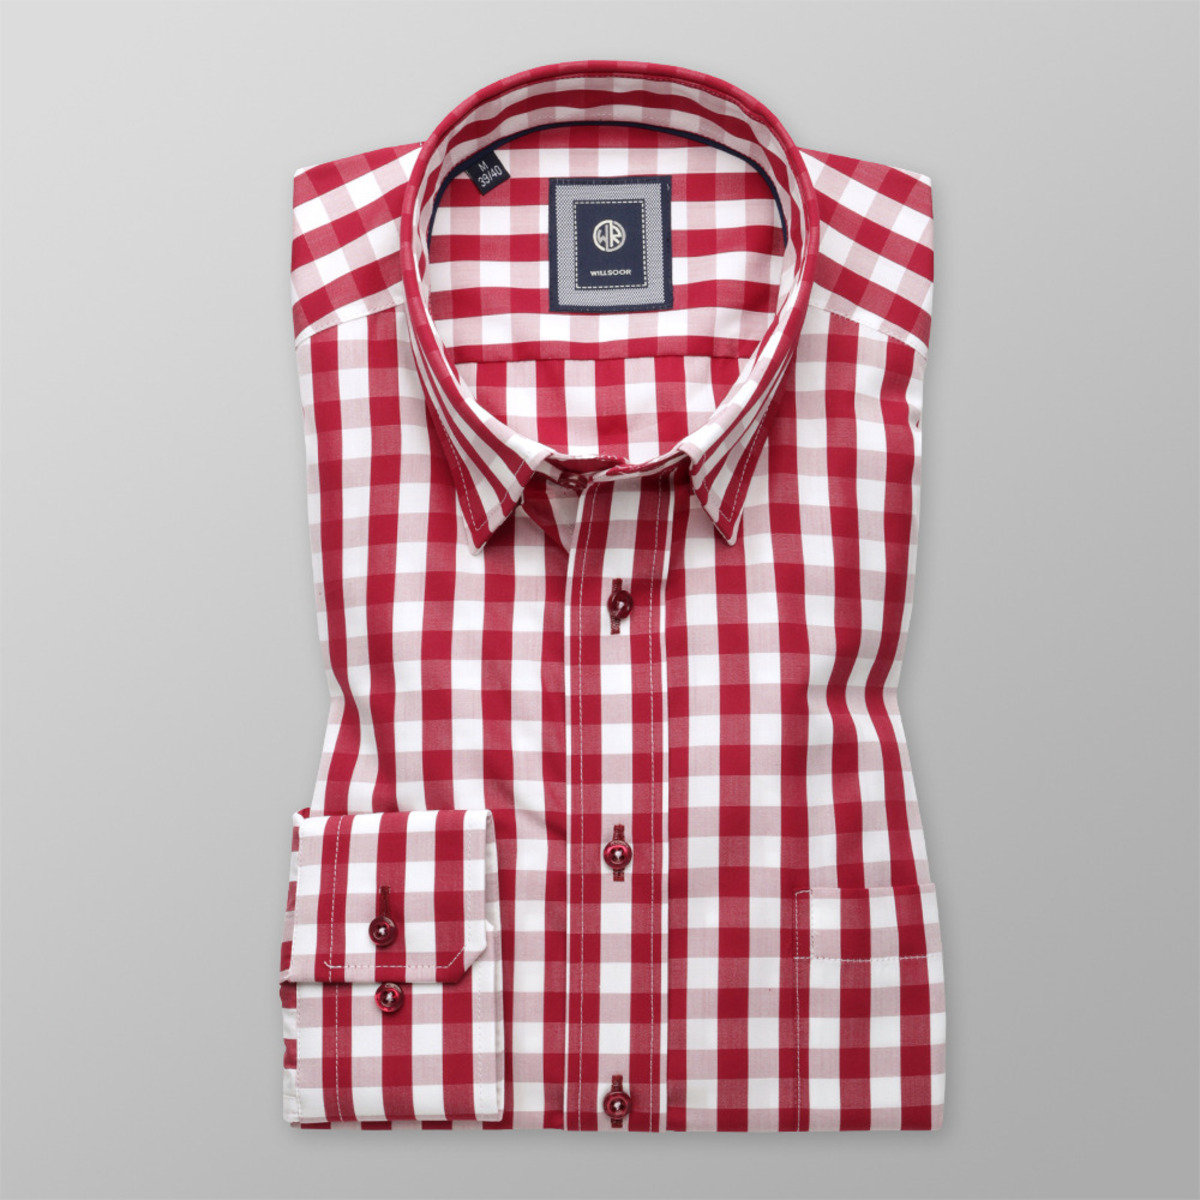 2476410d46b Pánská košile Slim Fit kostkovaná (výška 176-182) 9609 176-182